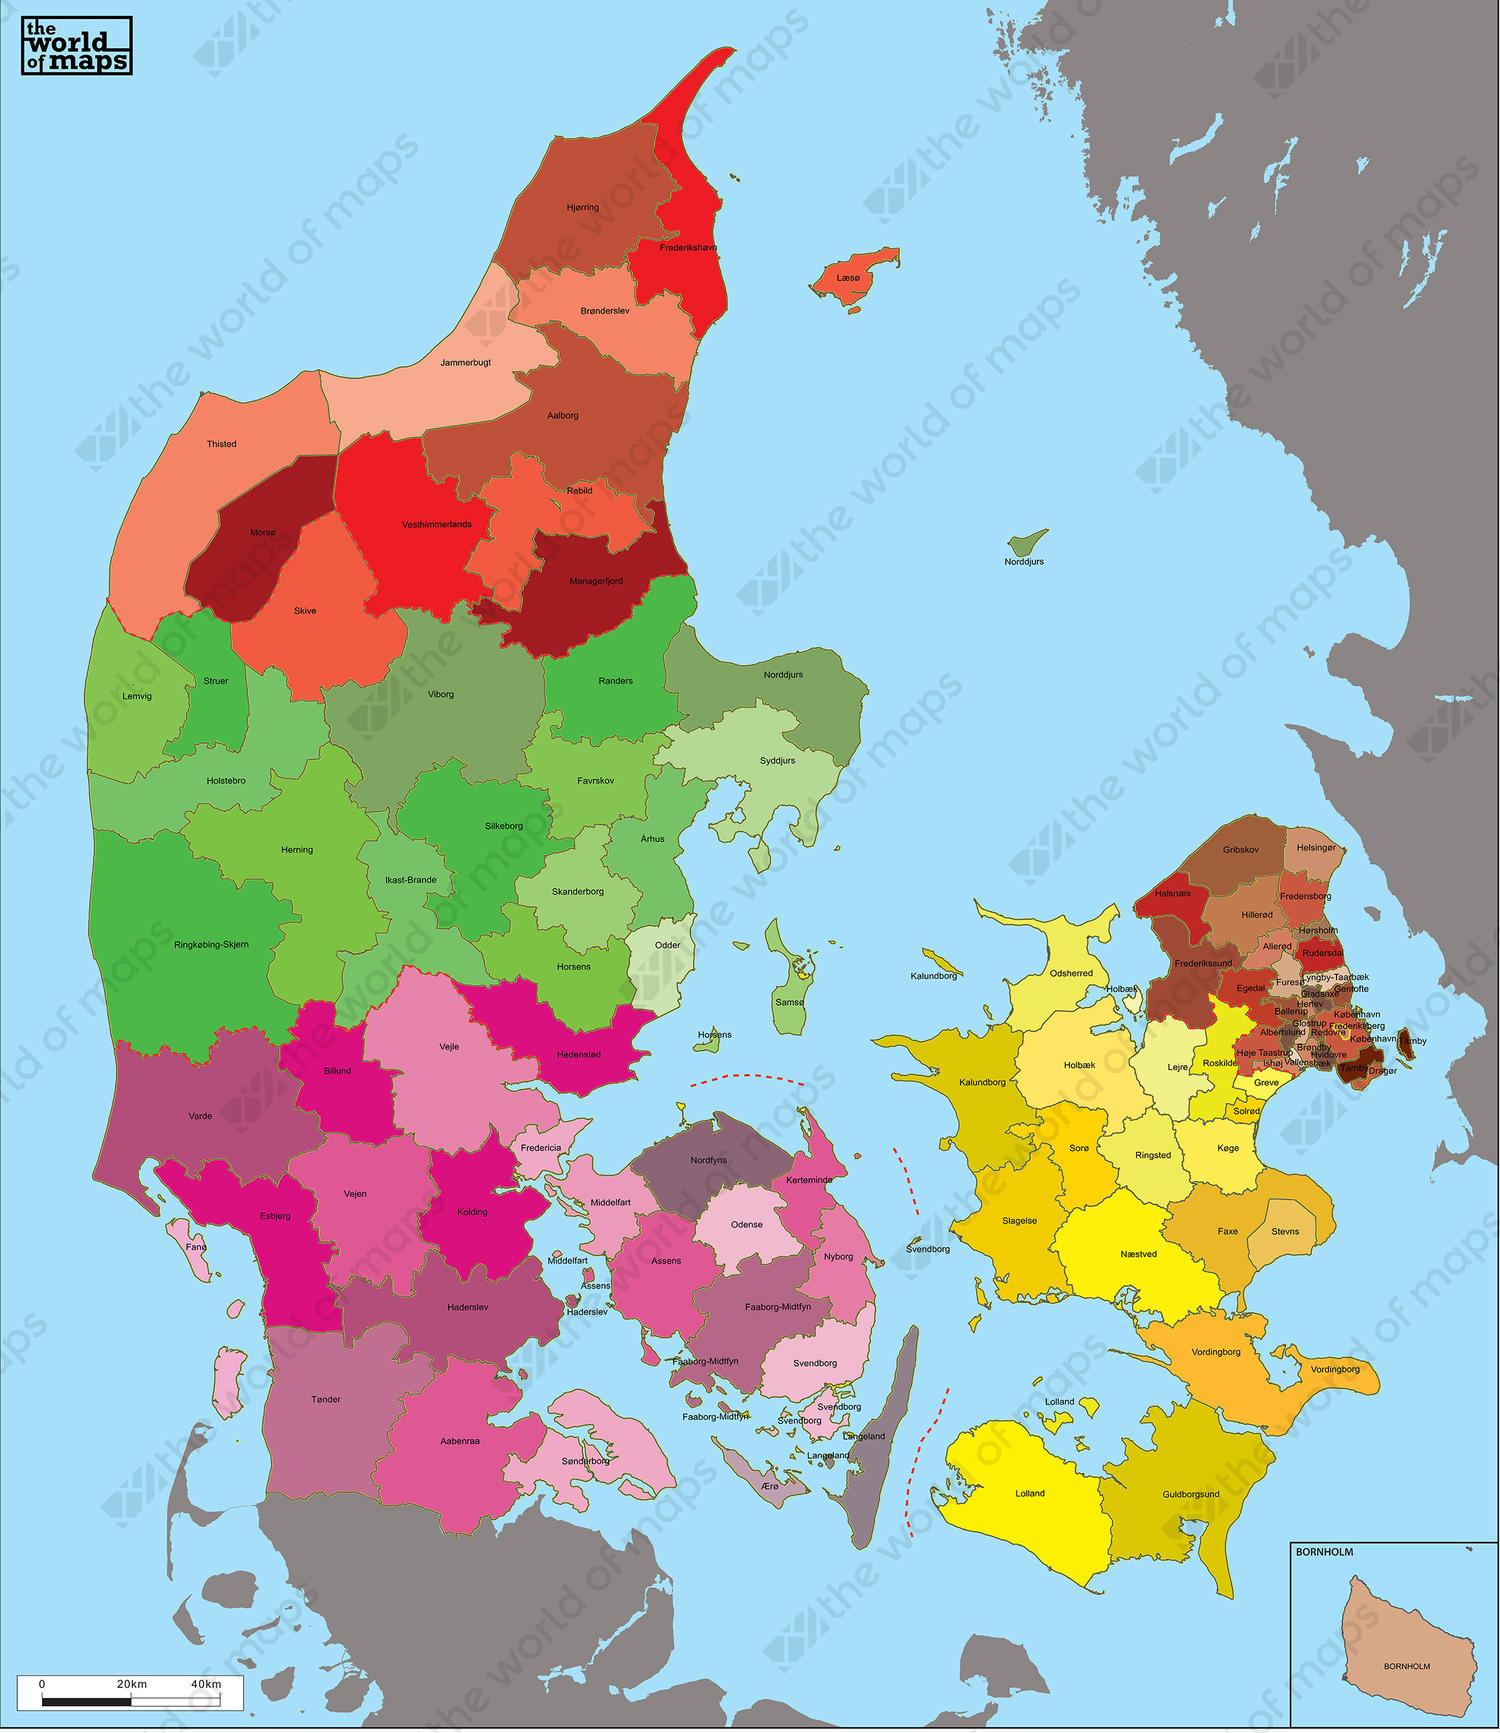 Digital municipal map denmark 6 the world of maps digital municipal map denmark gumiabroncs Choice Image